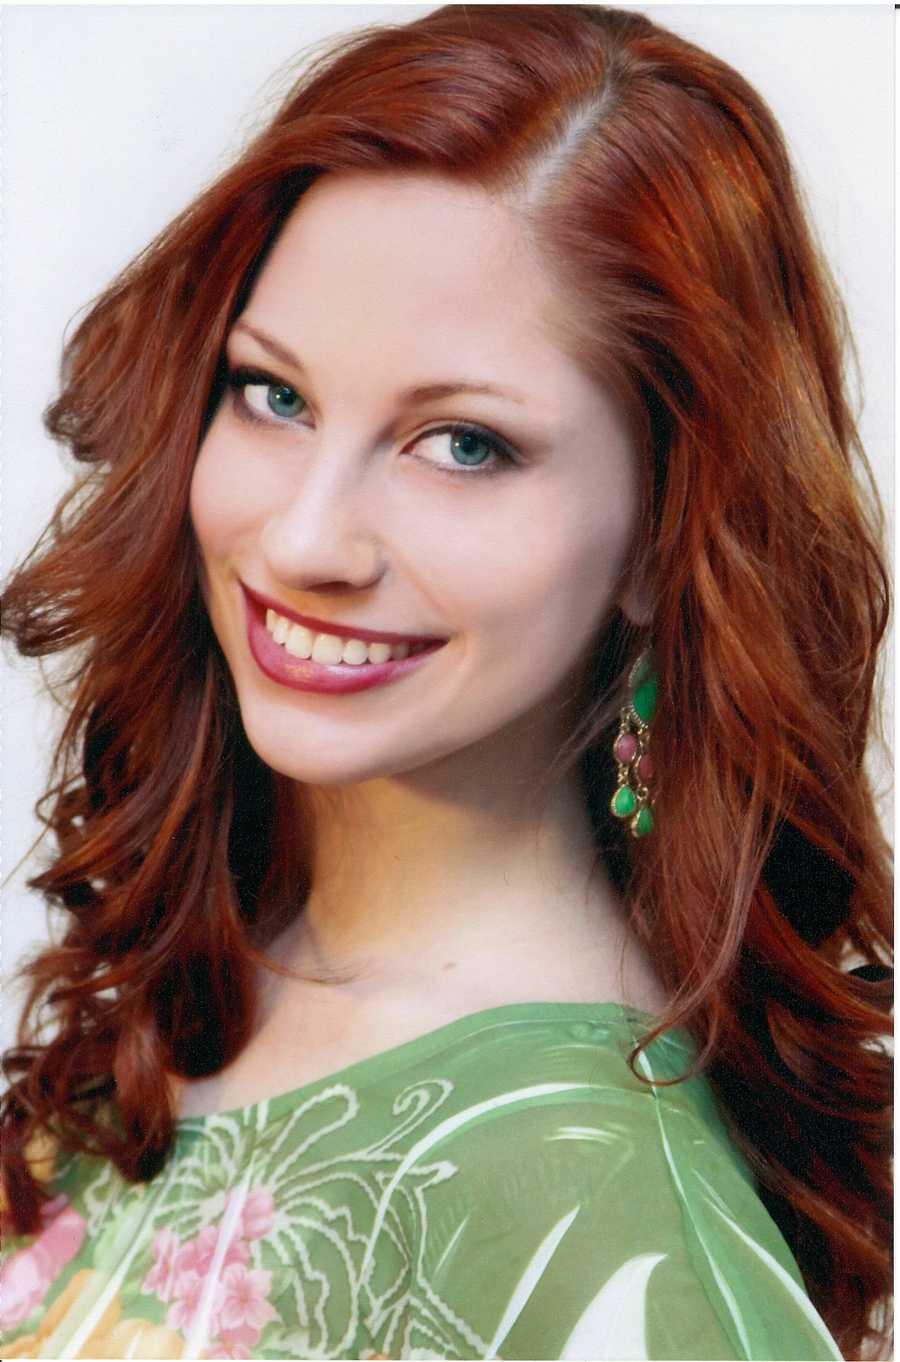 Lindsay Hanna, 23, Miss Mountain CityIn the Lymelight -- Lyme Disease AwarenessPiano